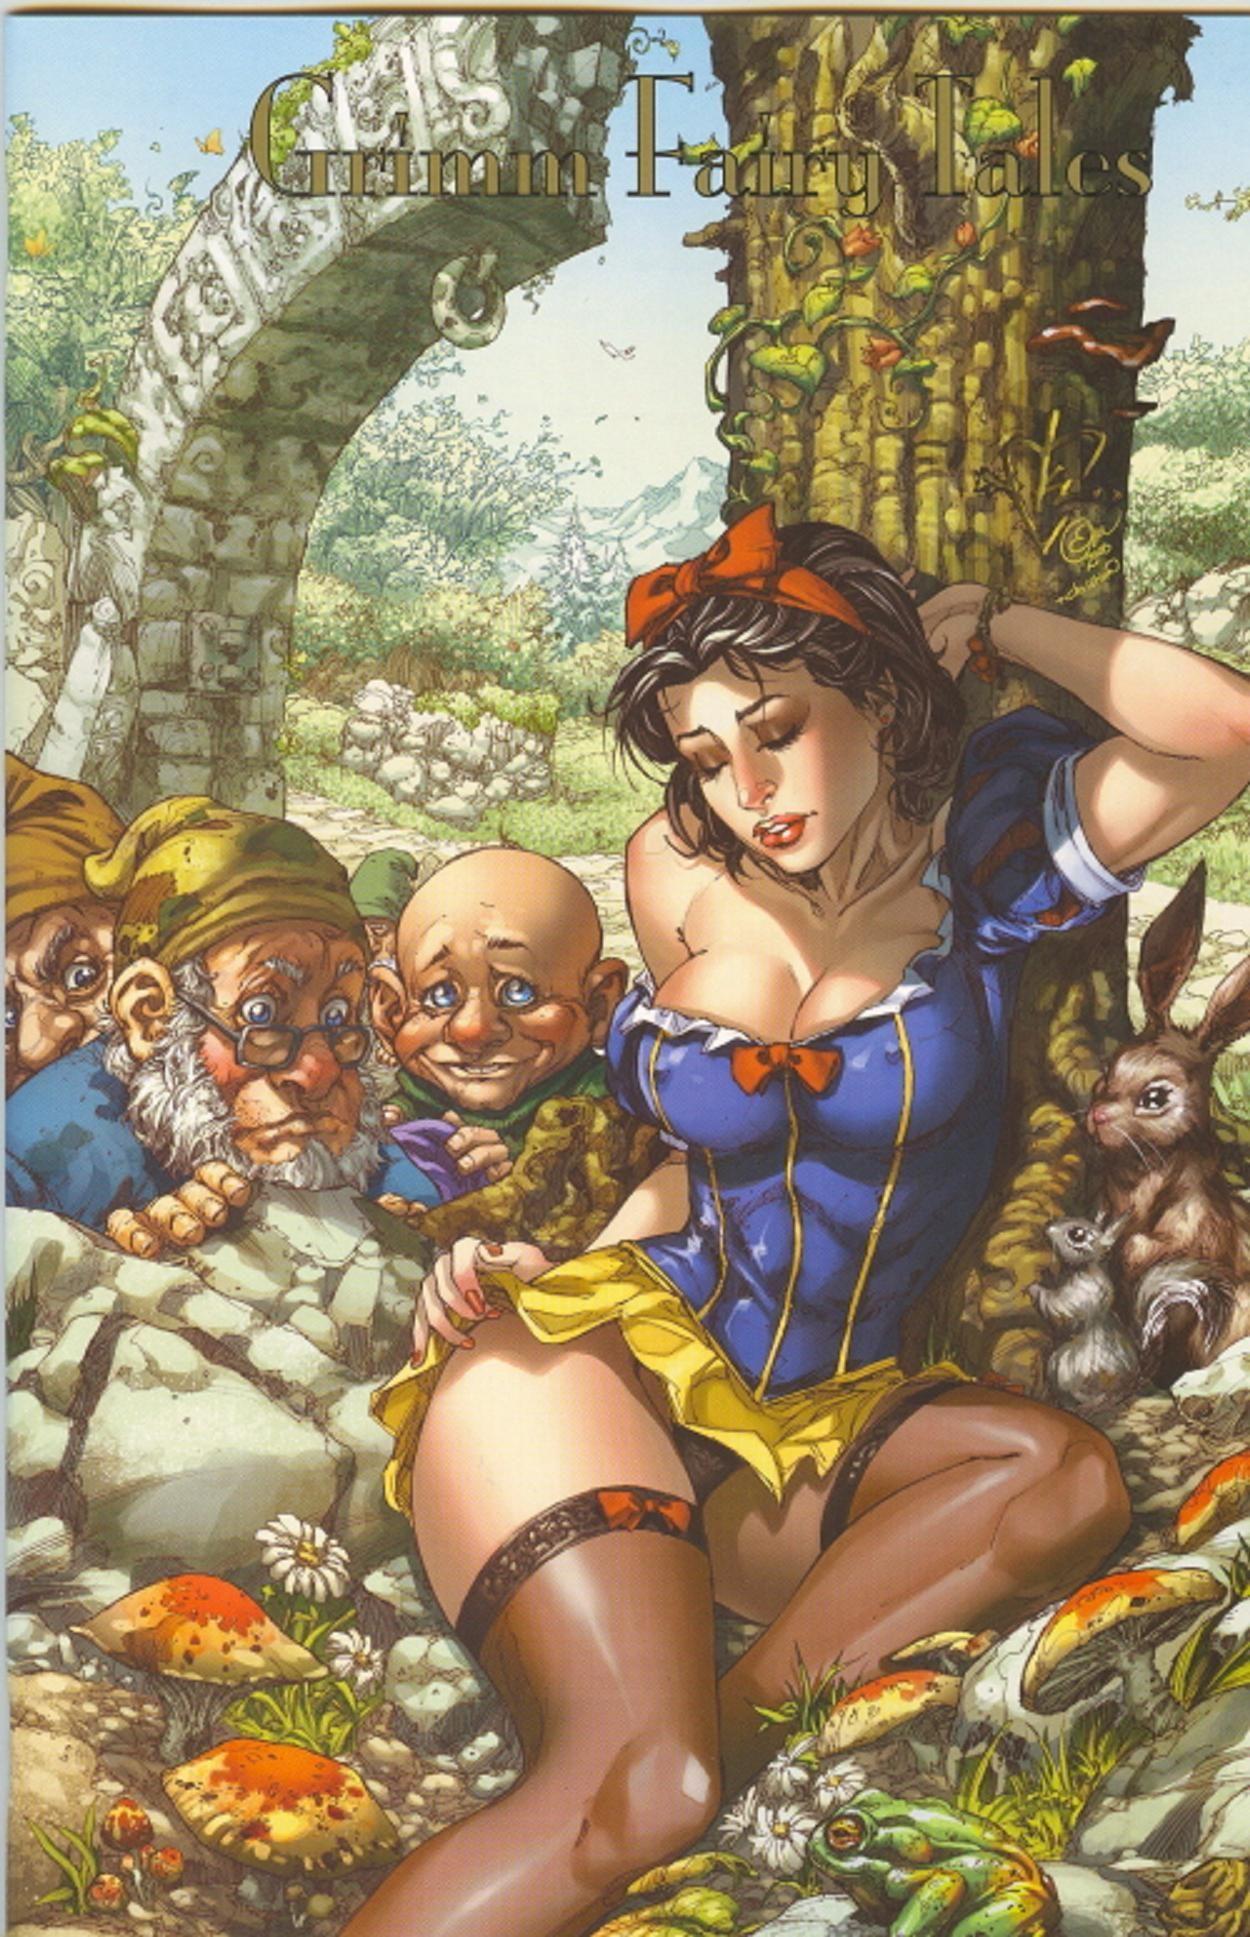 Free xxx fetish fairy tales adult dvd  sexual photo